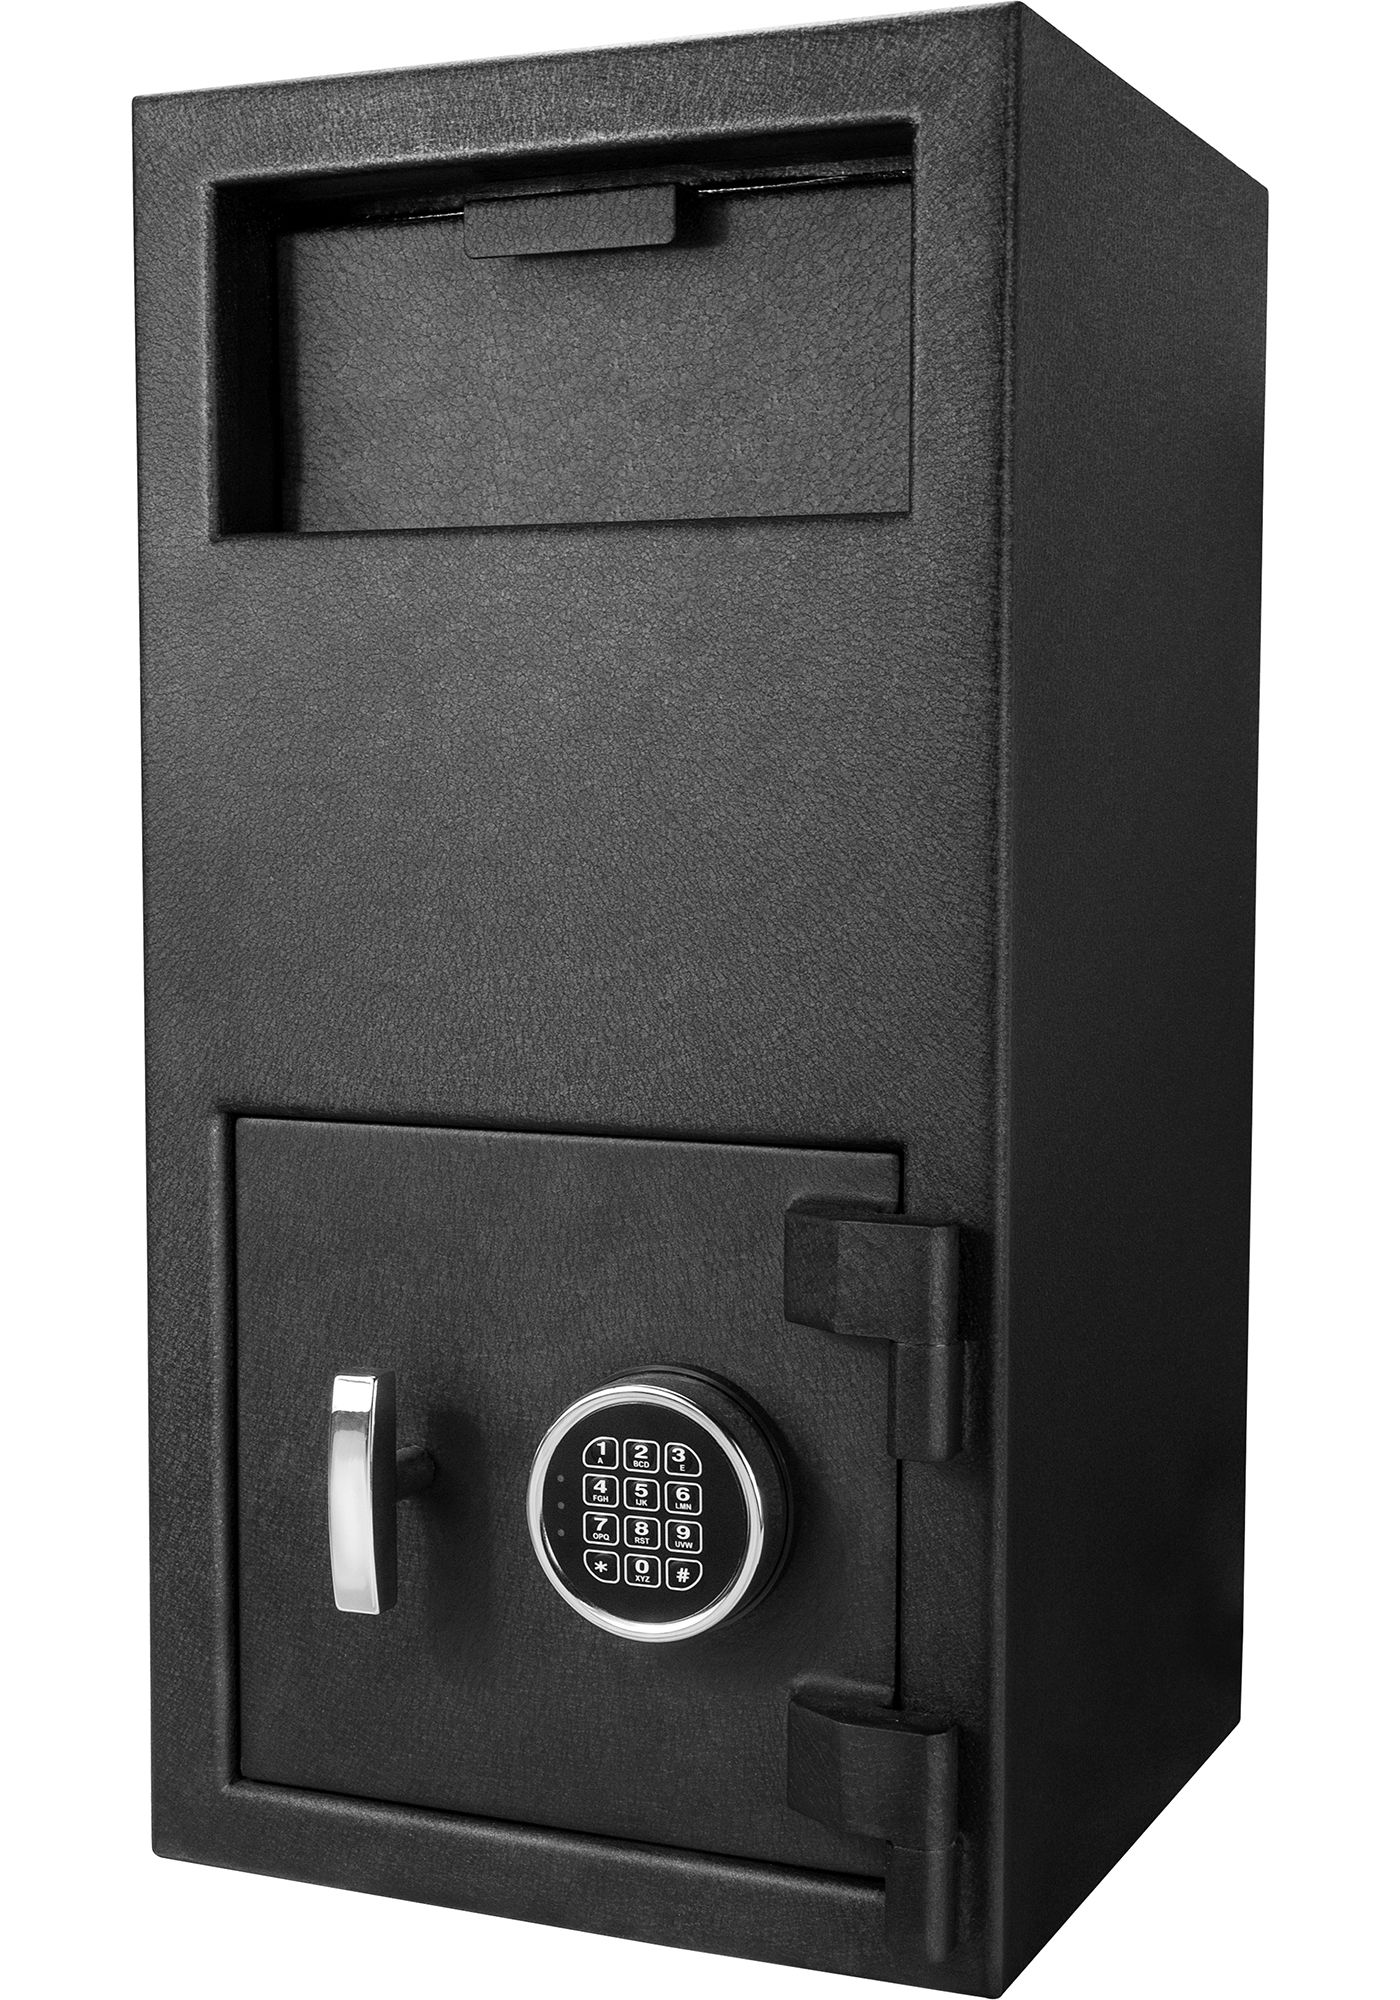 Barska DX-300 Large Depository Safe with Keypad Lock